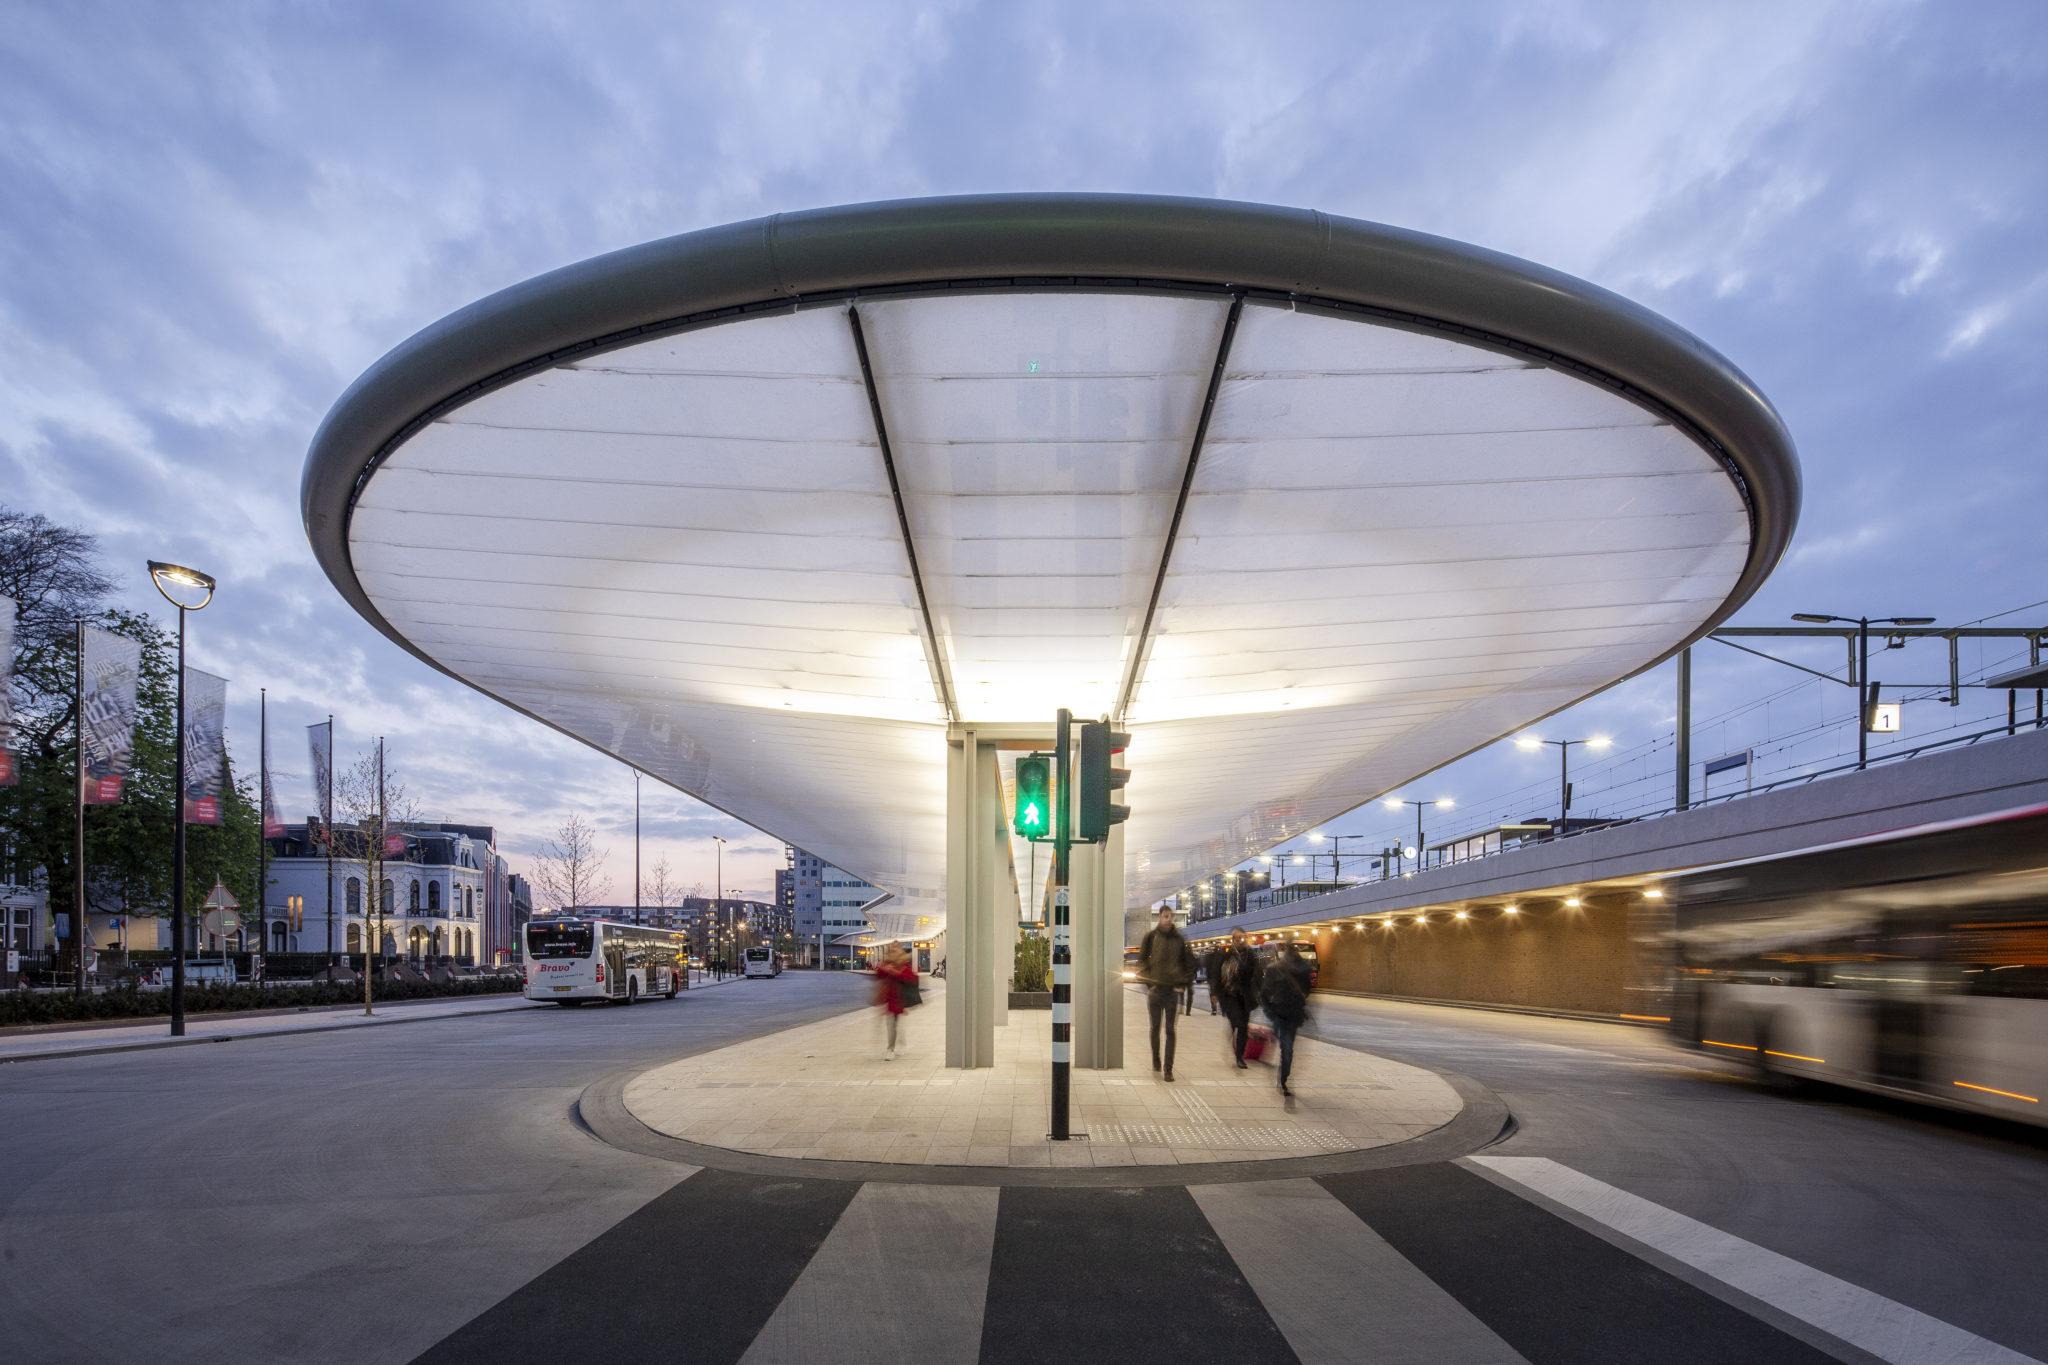 verlichting busstation Tilburg